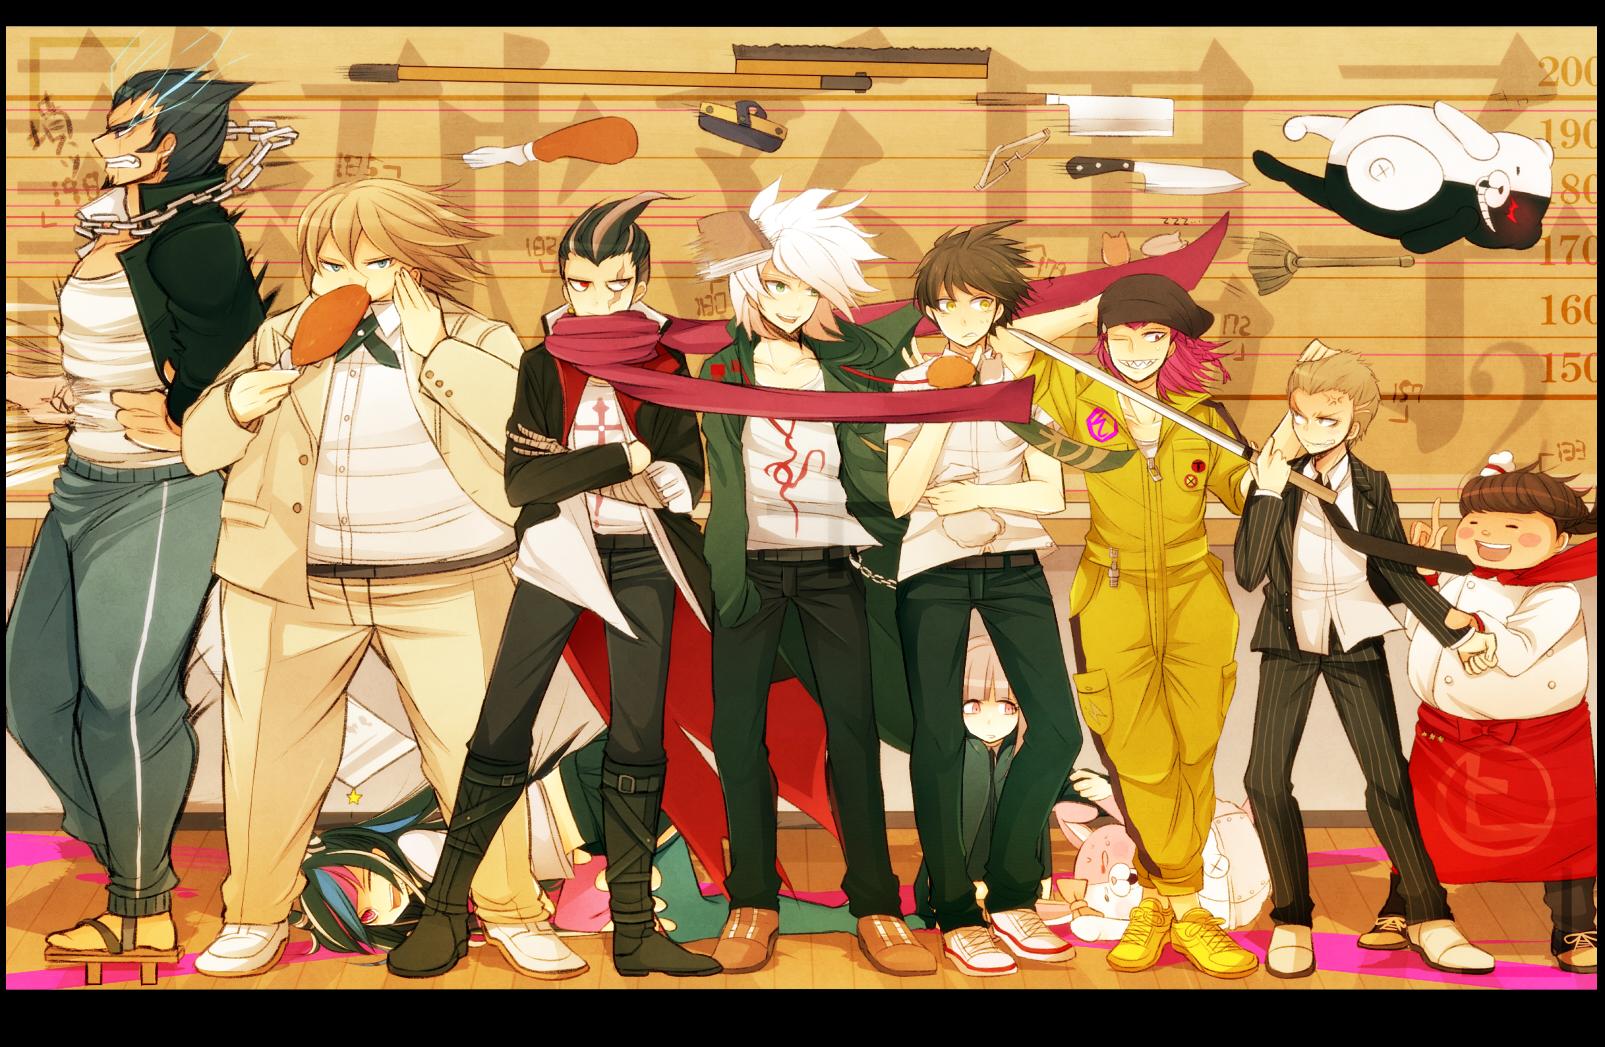 Tags Anime Pixiv Id 3325834 Super Danganronpa 2 Komaeda Nagito Kuzuryuu